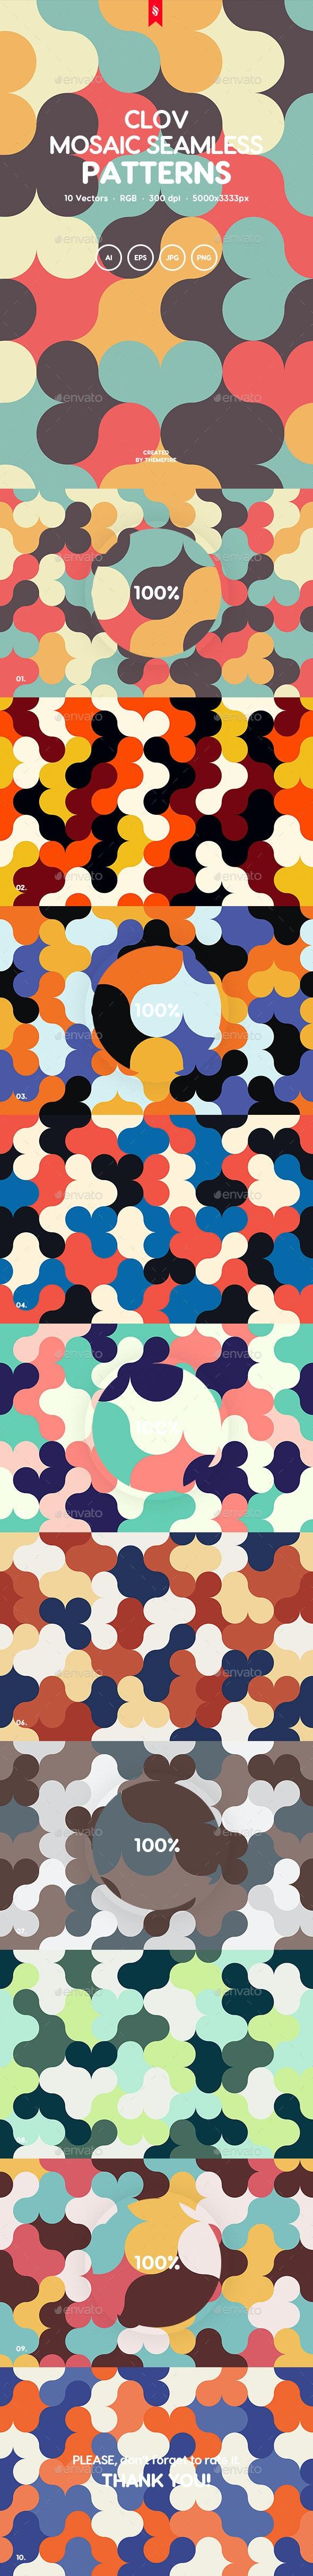 Clov - Retro Mosaic Backgrounds - Patterns Backgrounds